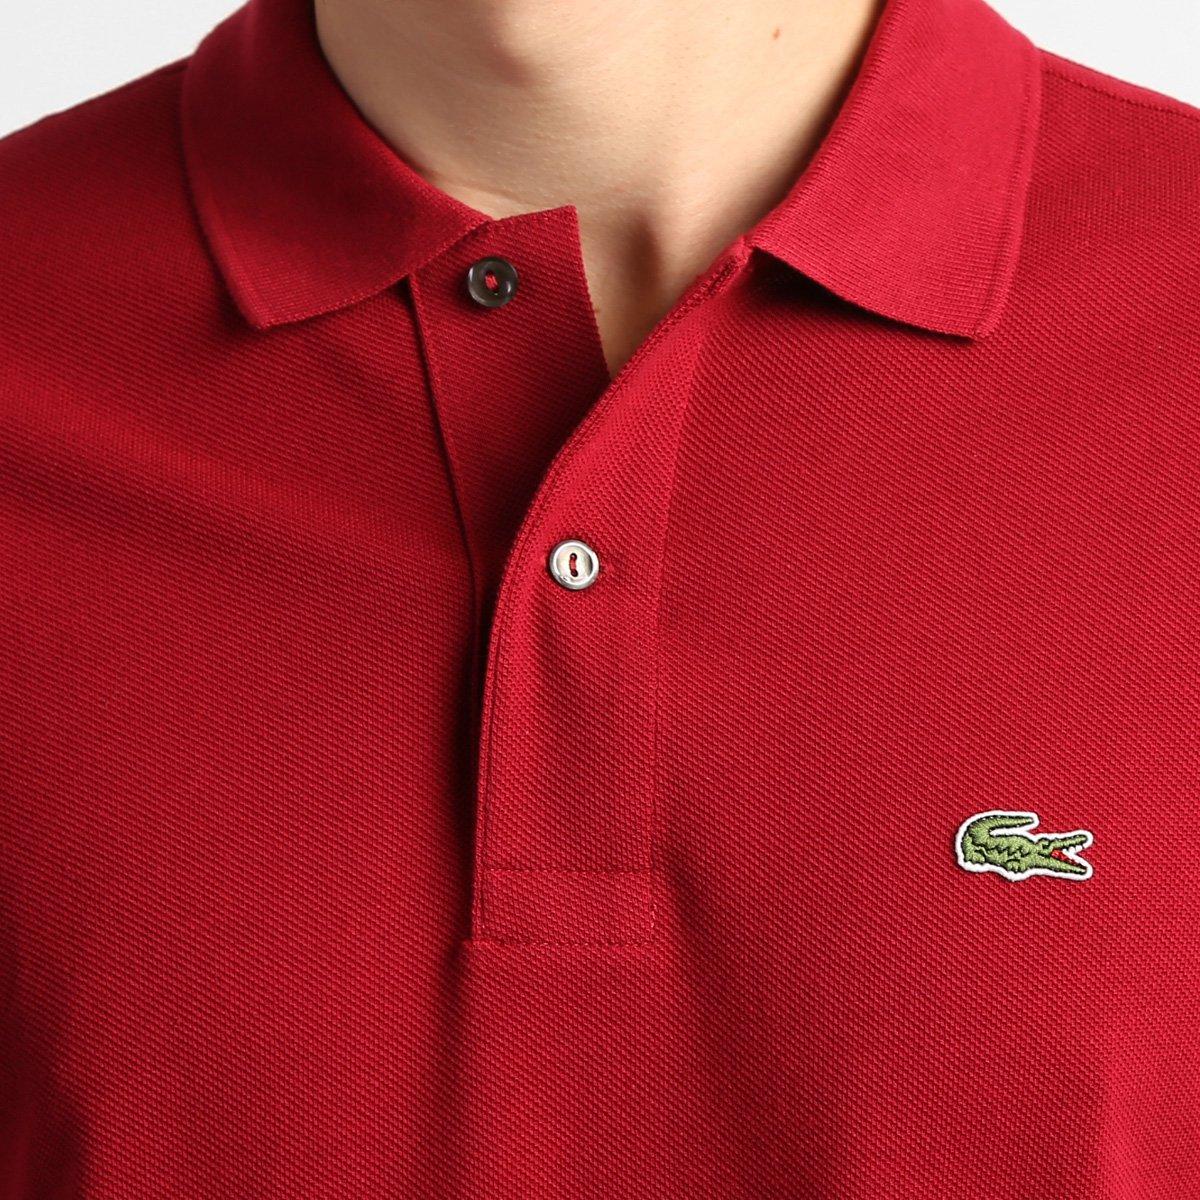 Camisa Polo Lacoste Original Fit Masculina - Bordô - Compre Agora ... 506b3b258e0e9